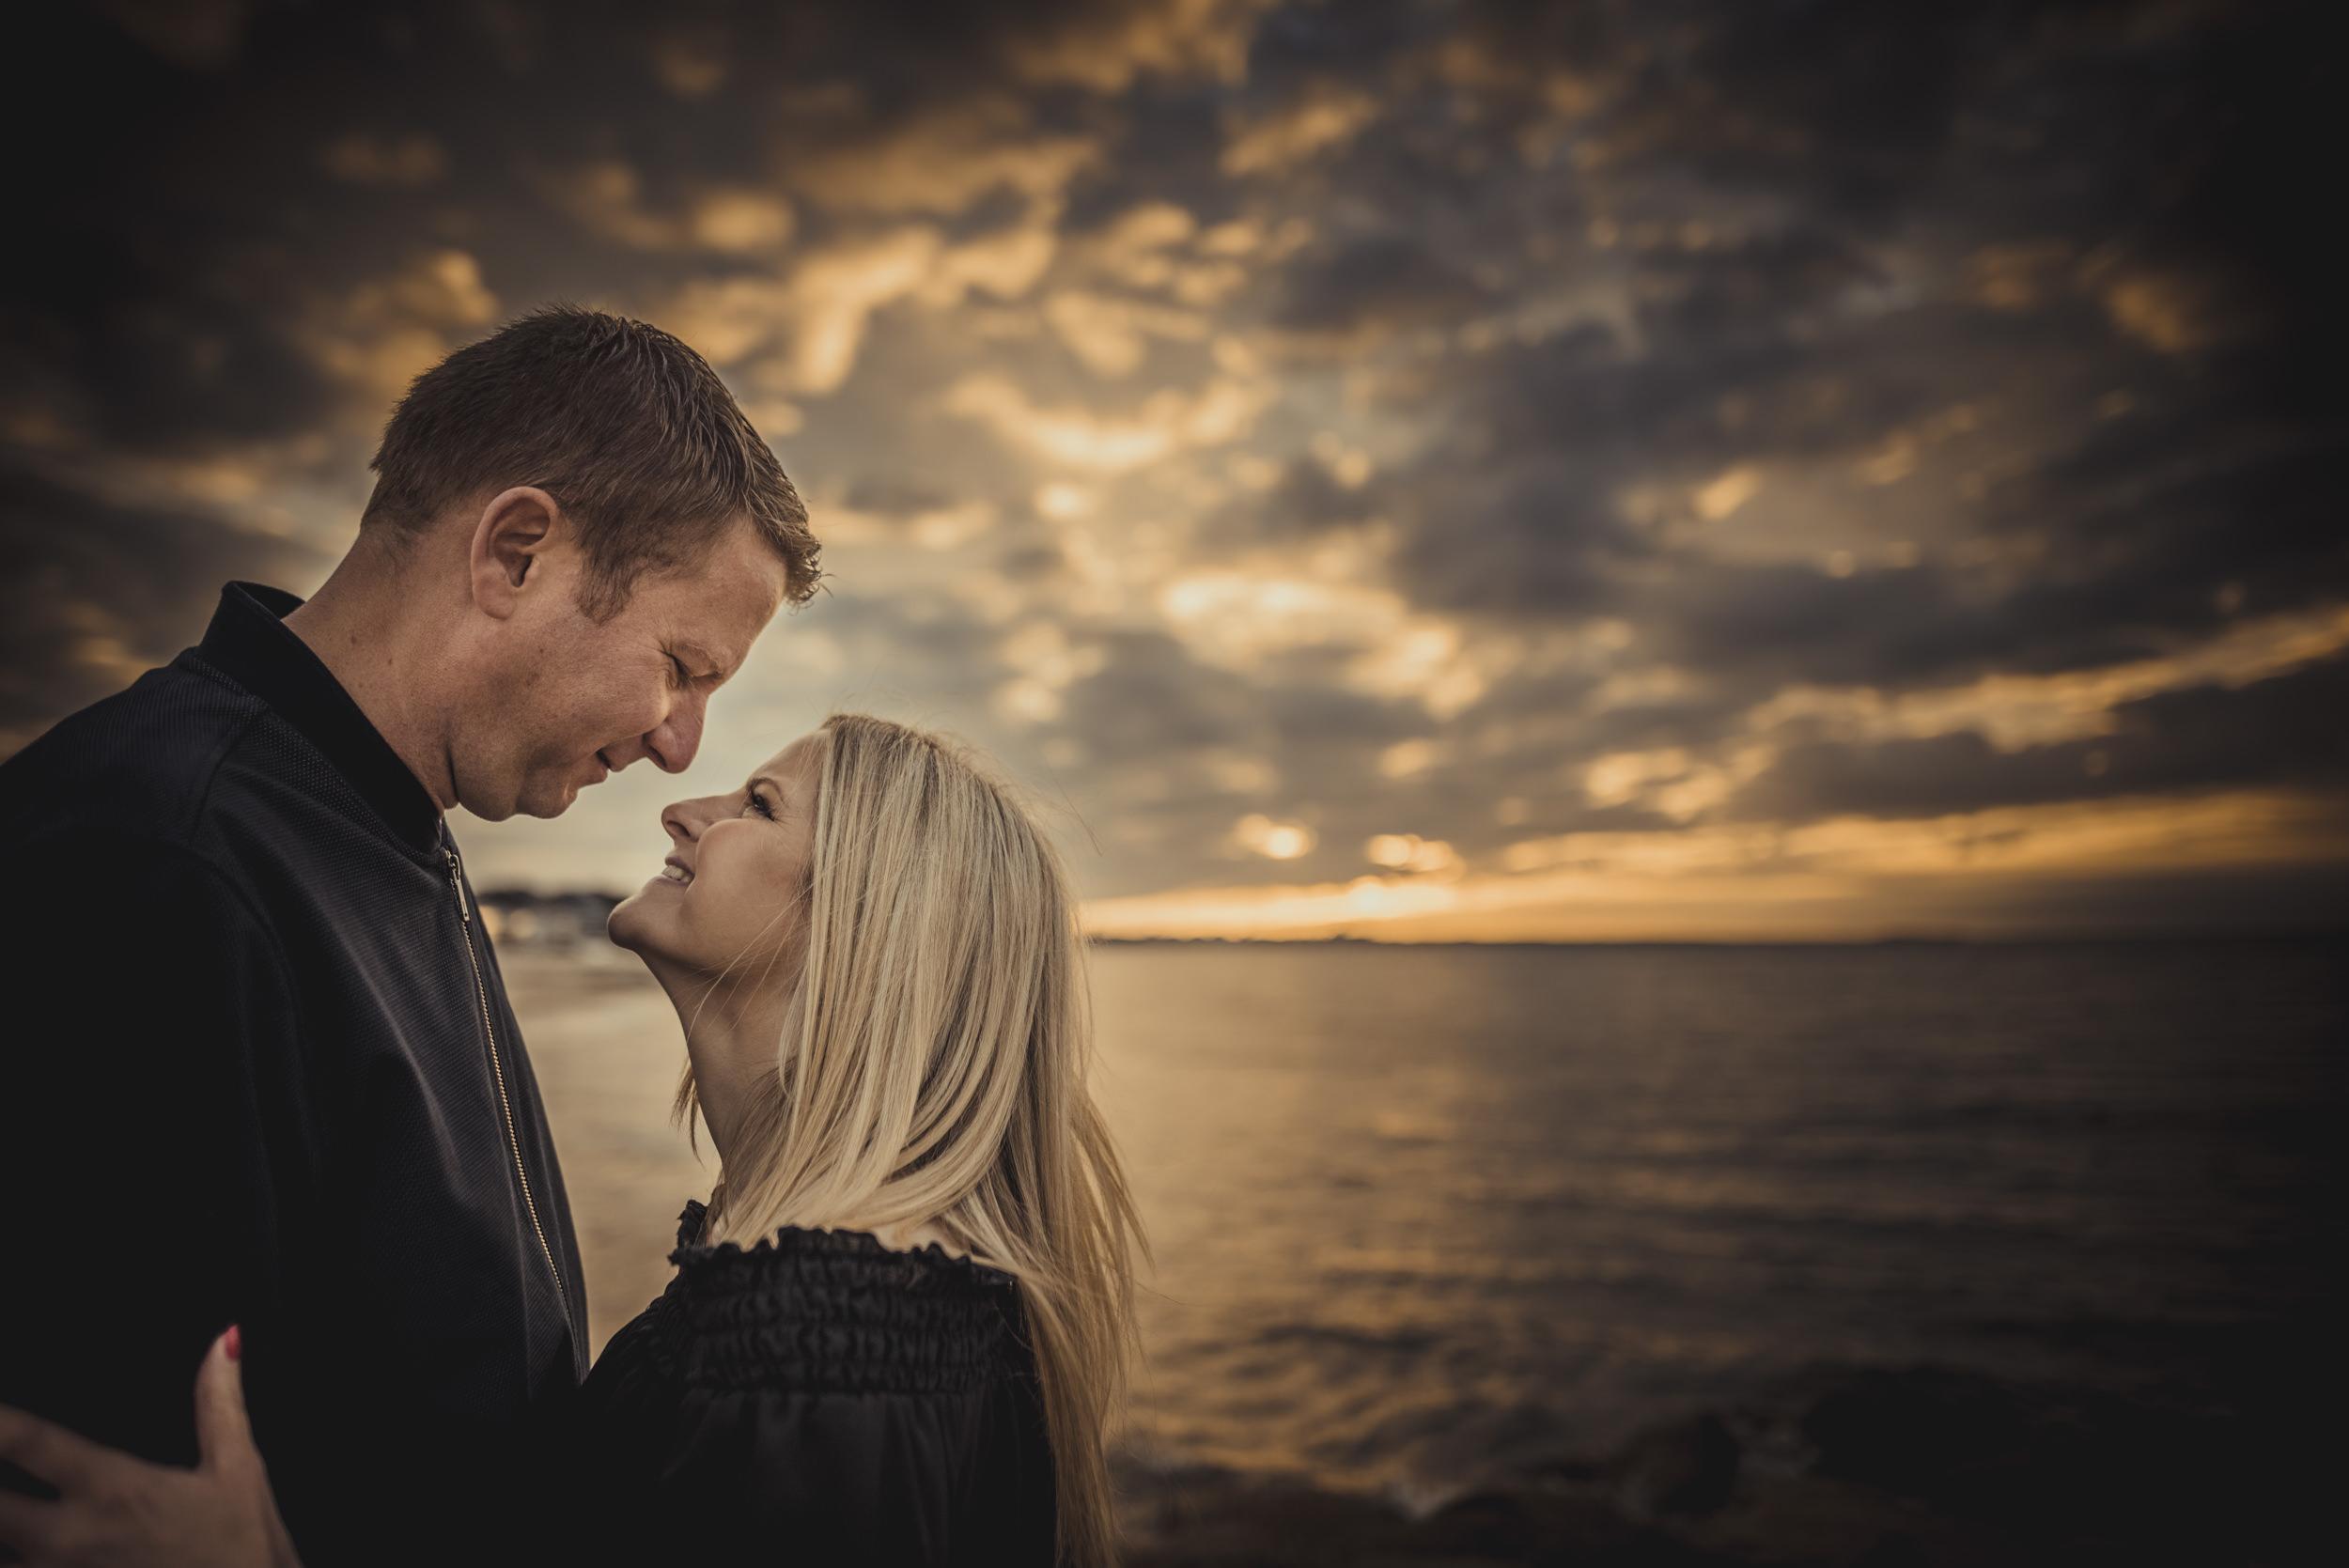 Trisha-and-Robert-Engagement-session-Sandbanks-beach-Poole-Manu-Mendoza-Wedding-Photography-026.jpg